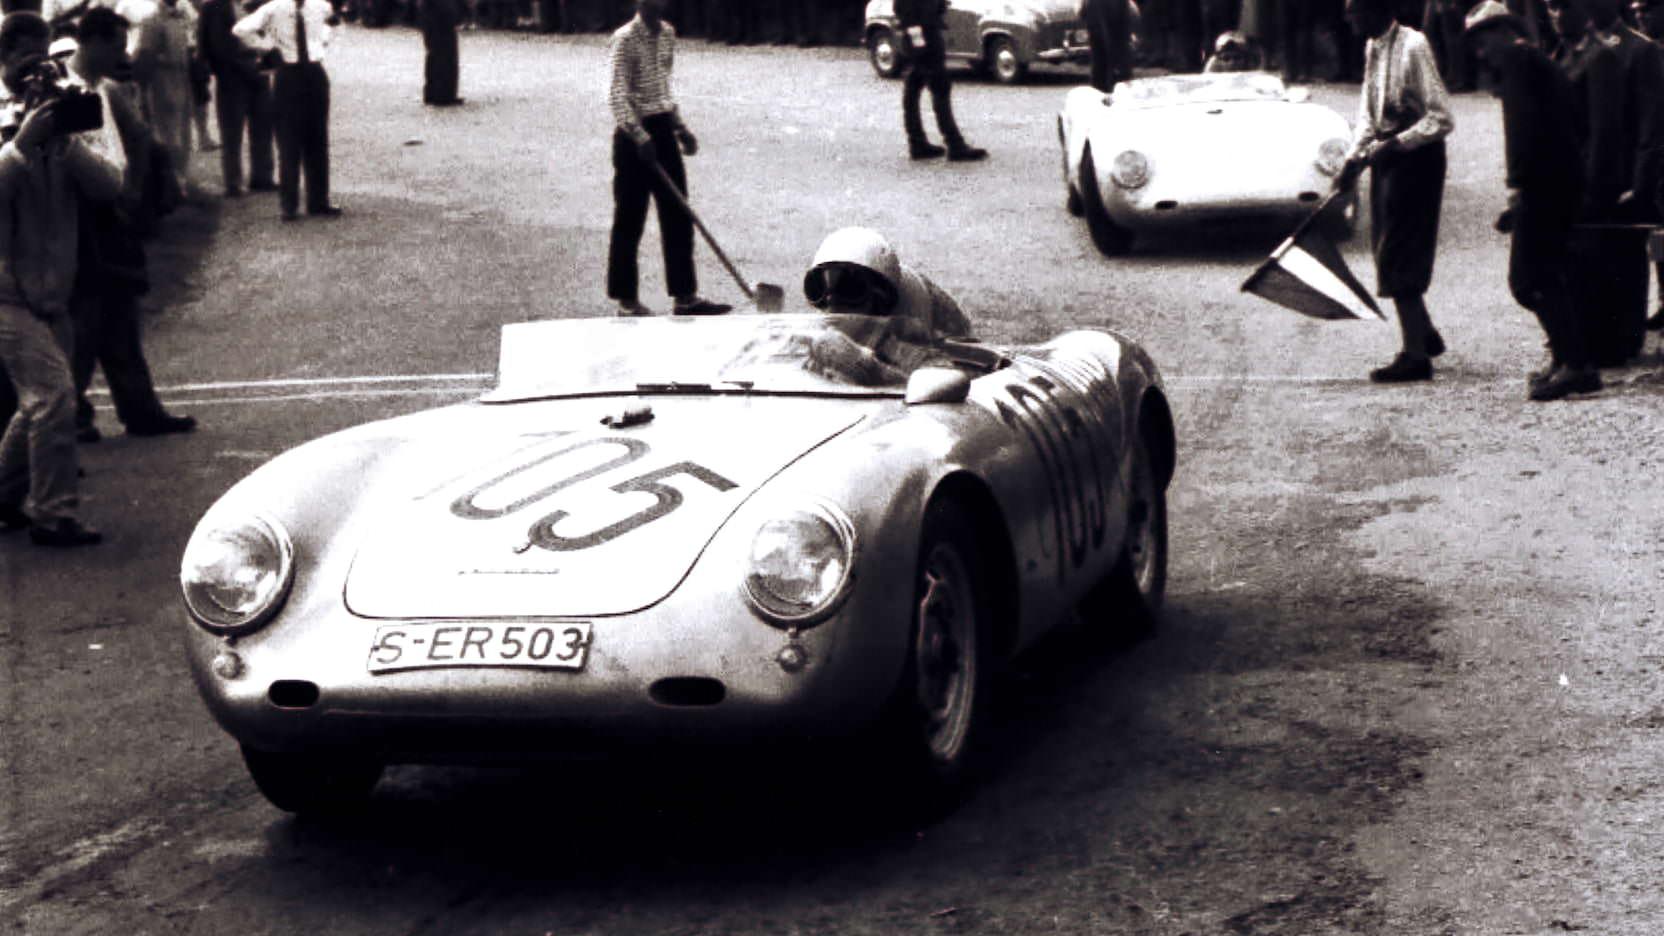 Porsche Targa For Sale >> The German Giant Killer - An Original Porsche 550A Spyder